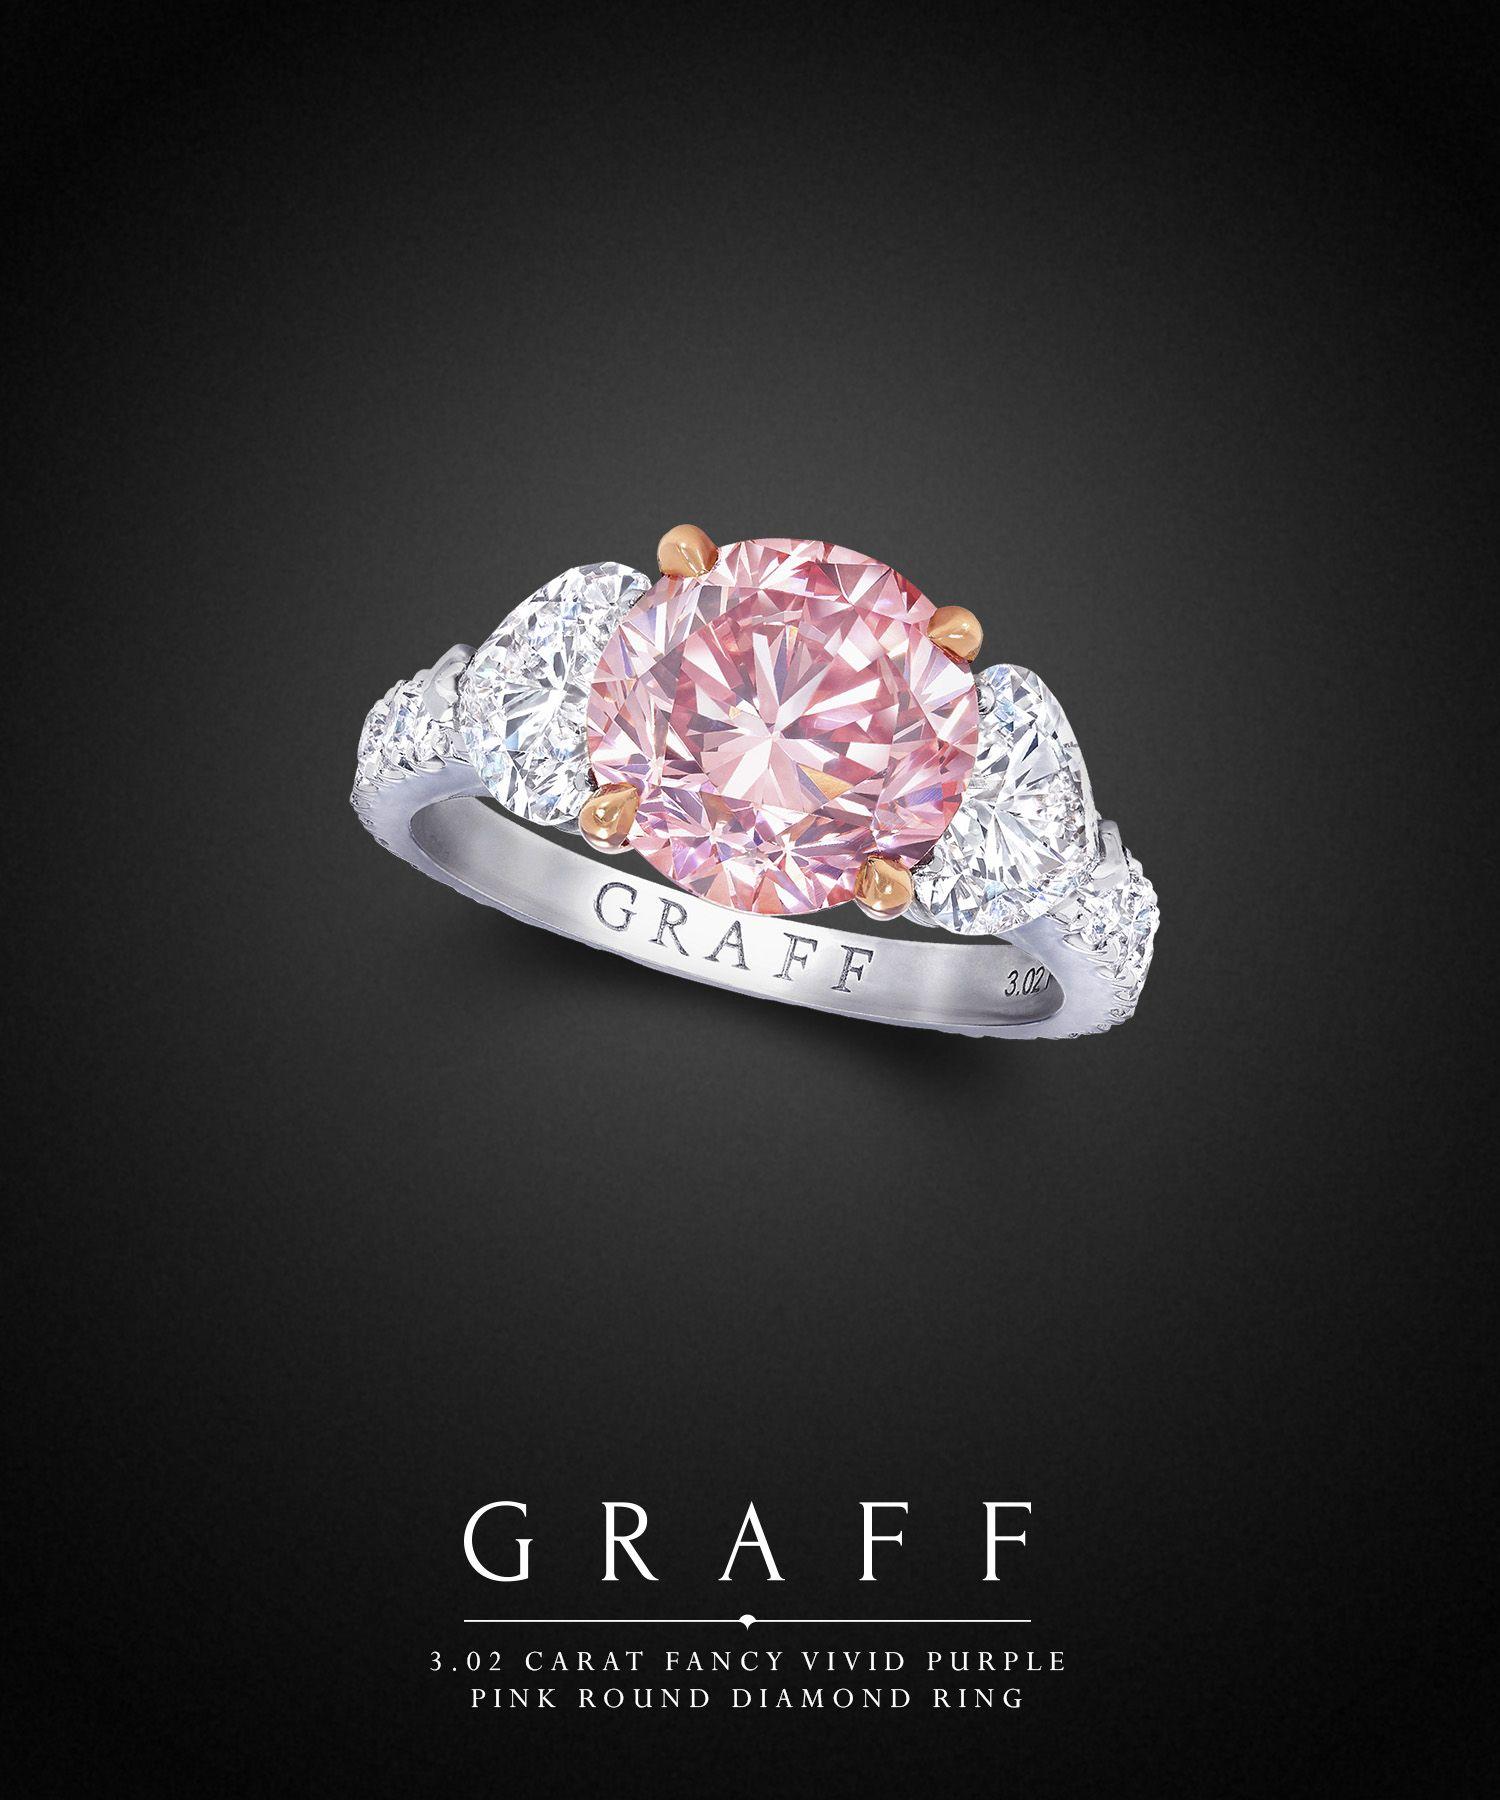 graff diamonds 3 02 carat fancy vivid purple pink round diamond